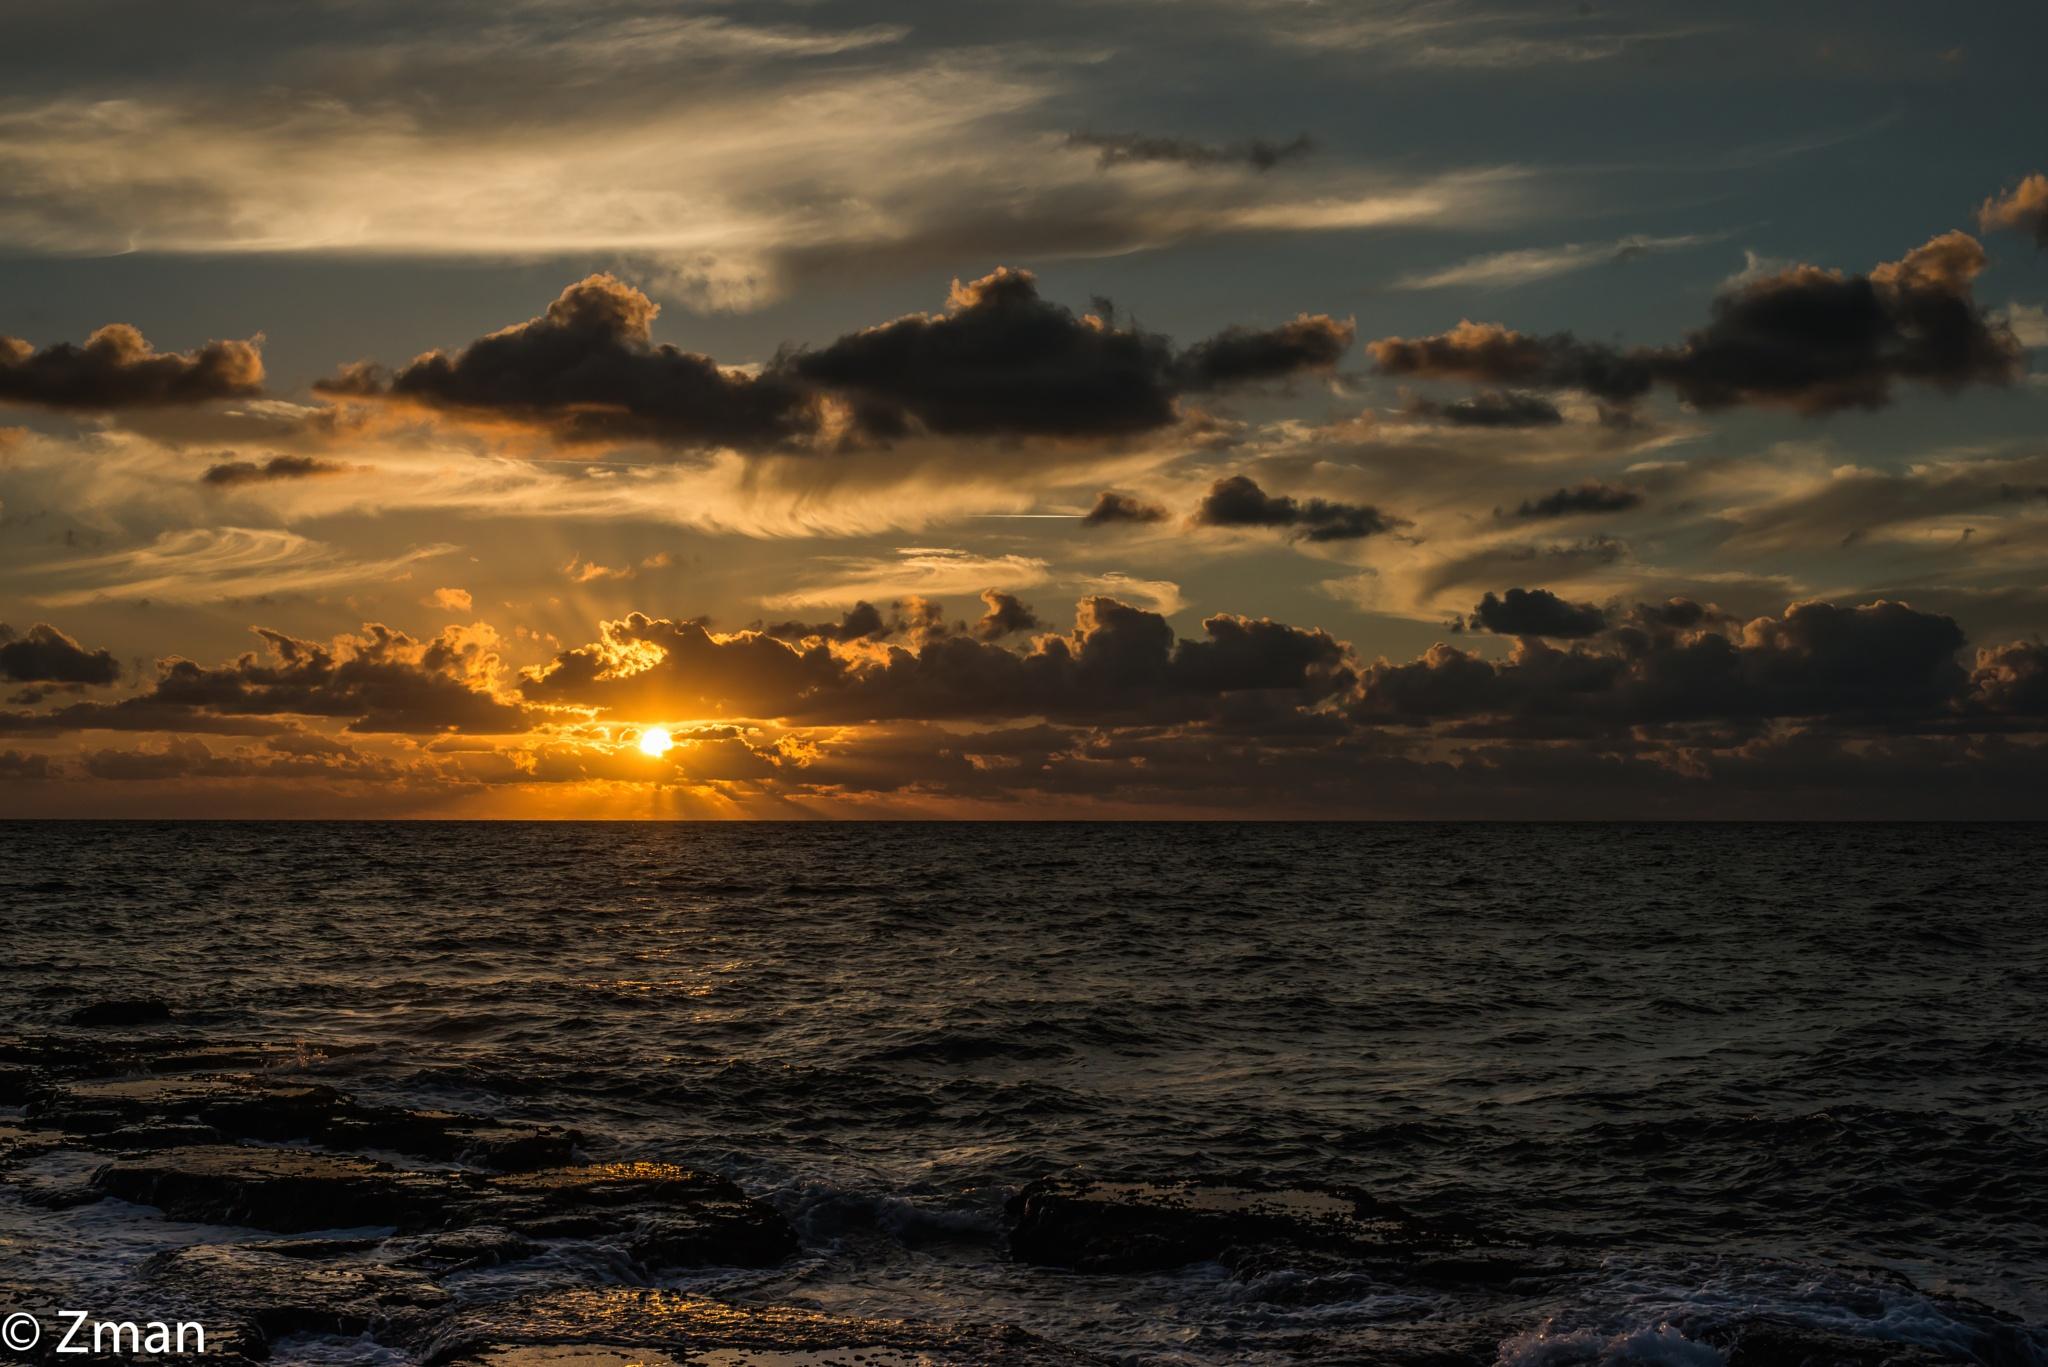 Golden Sunset by muhammad.nasser.963